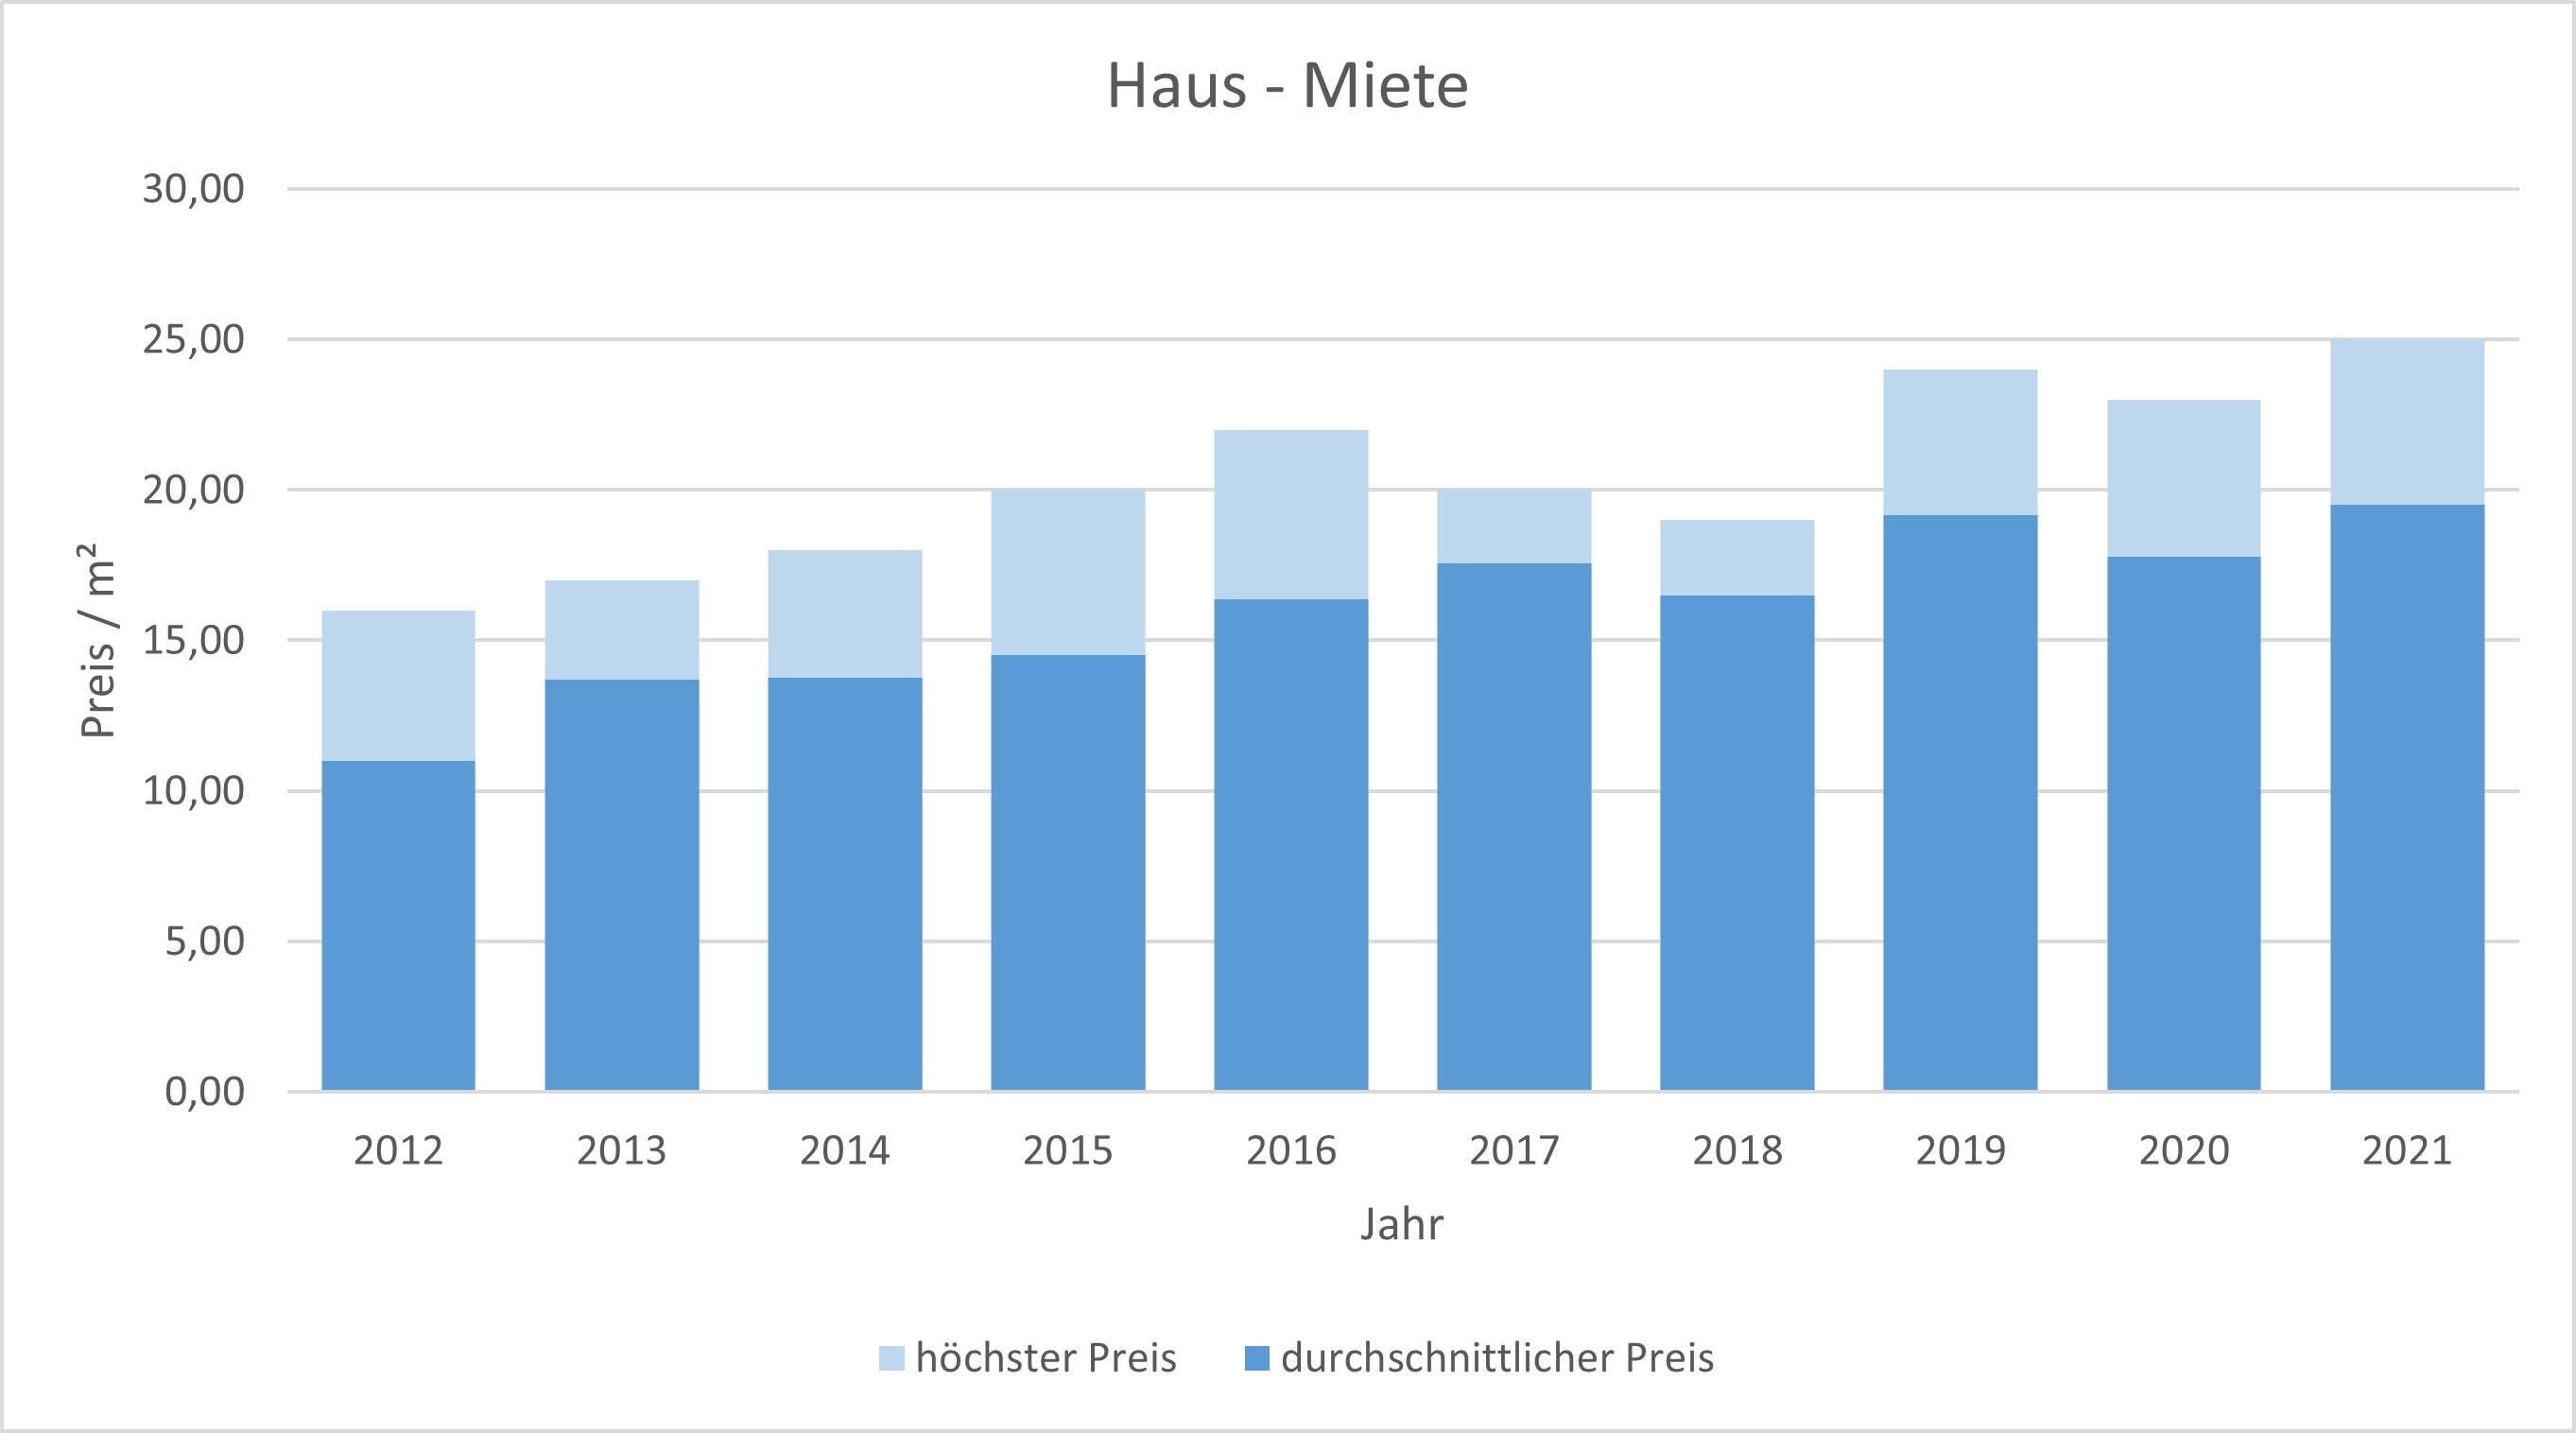 München - Obersendling Haus mieten vermieten Preis Bewertung Makler 2019 2020 2021 www.happy-immo.de